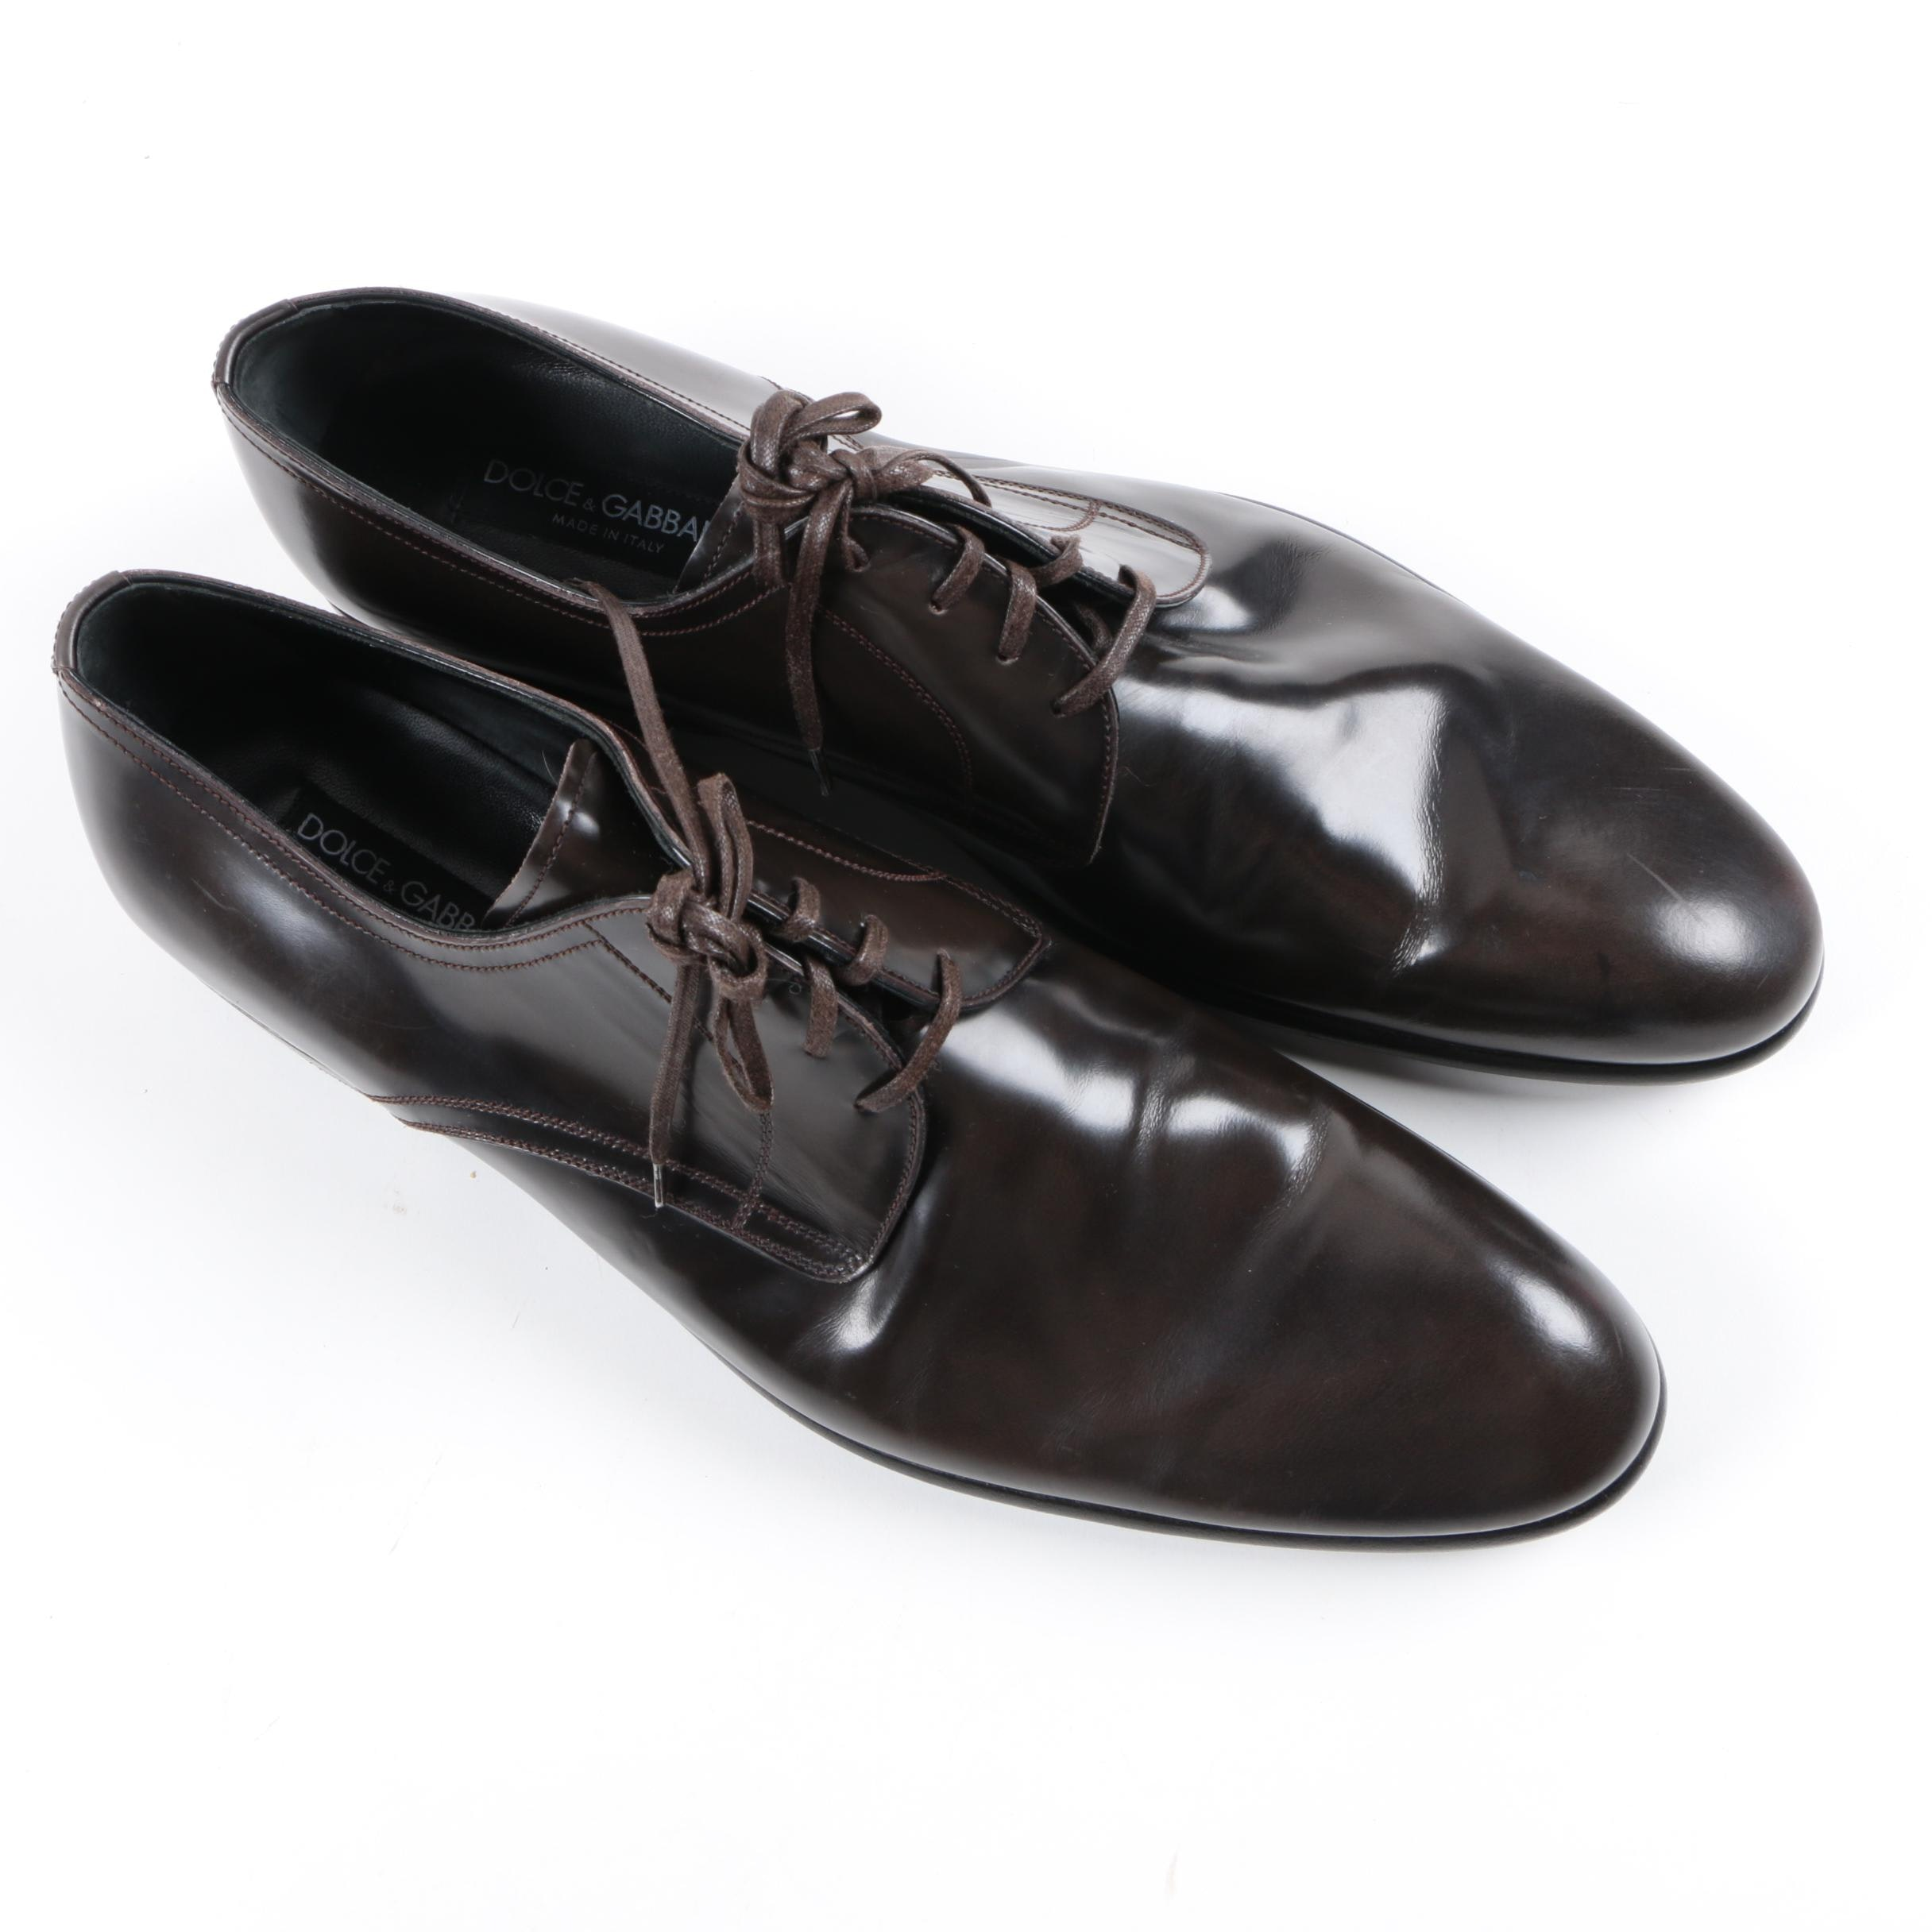 Men's Dolce & Gabbana Leather Derby Shoes